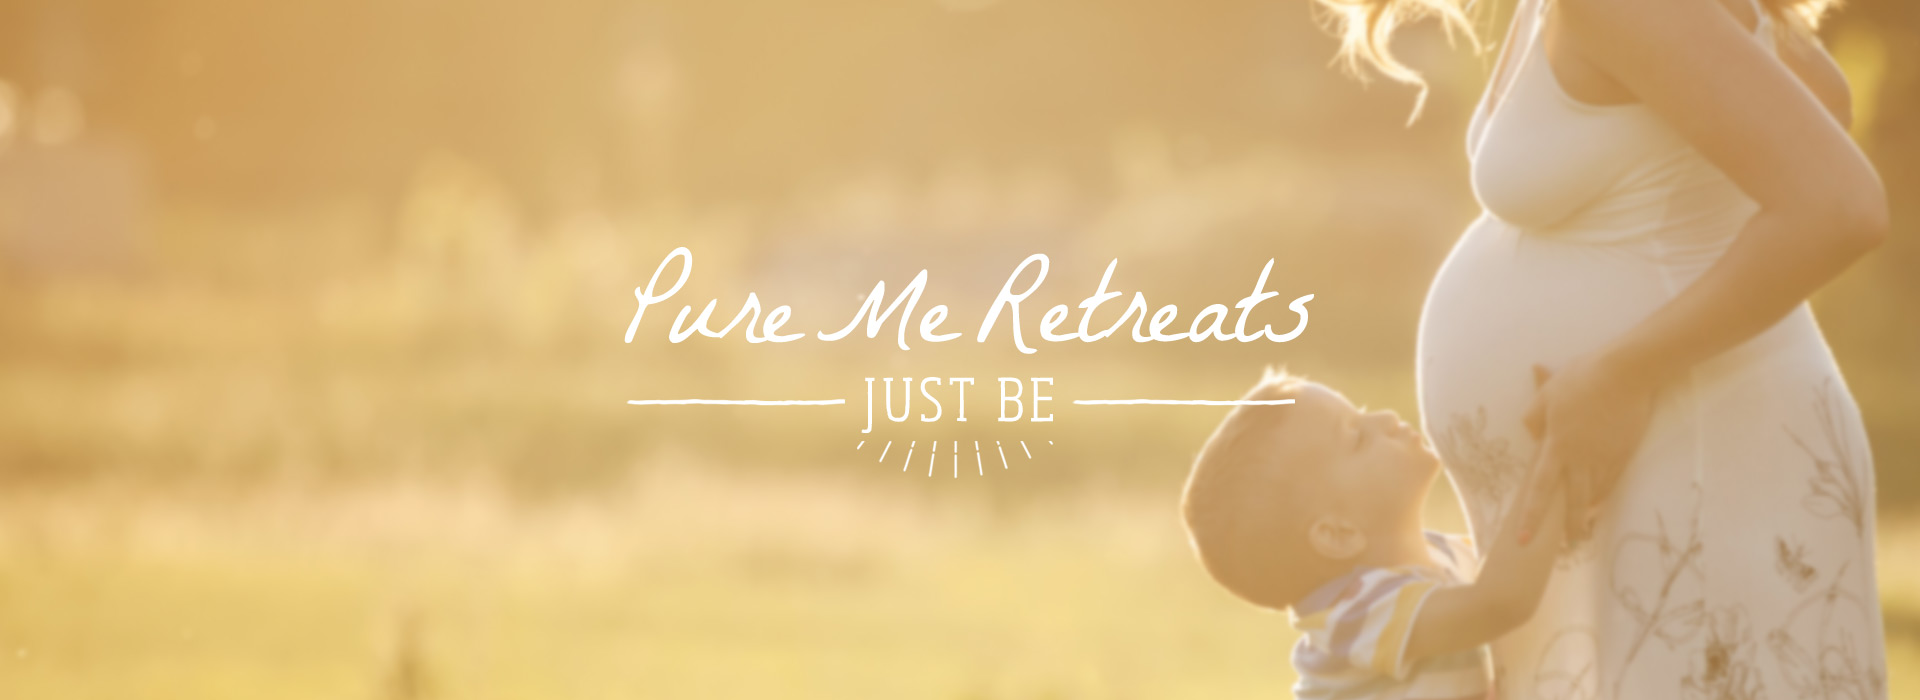 Pure-Me-Retreats-slider2